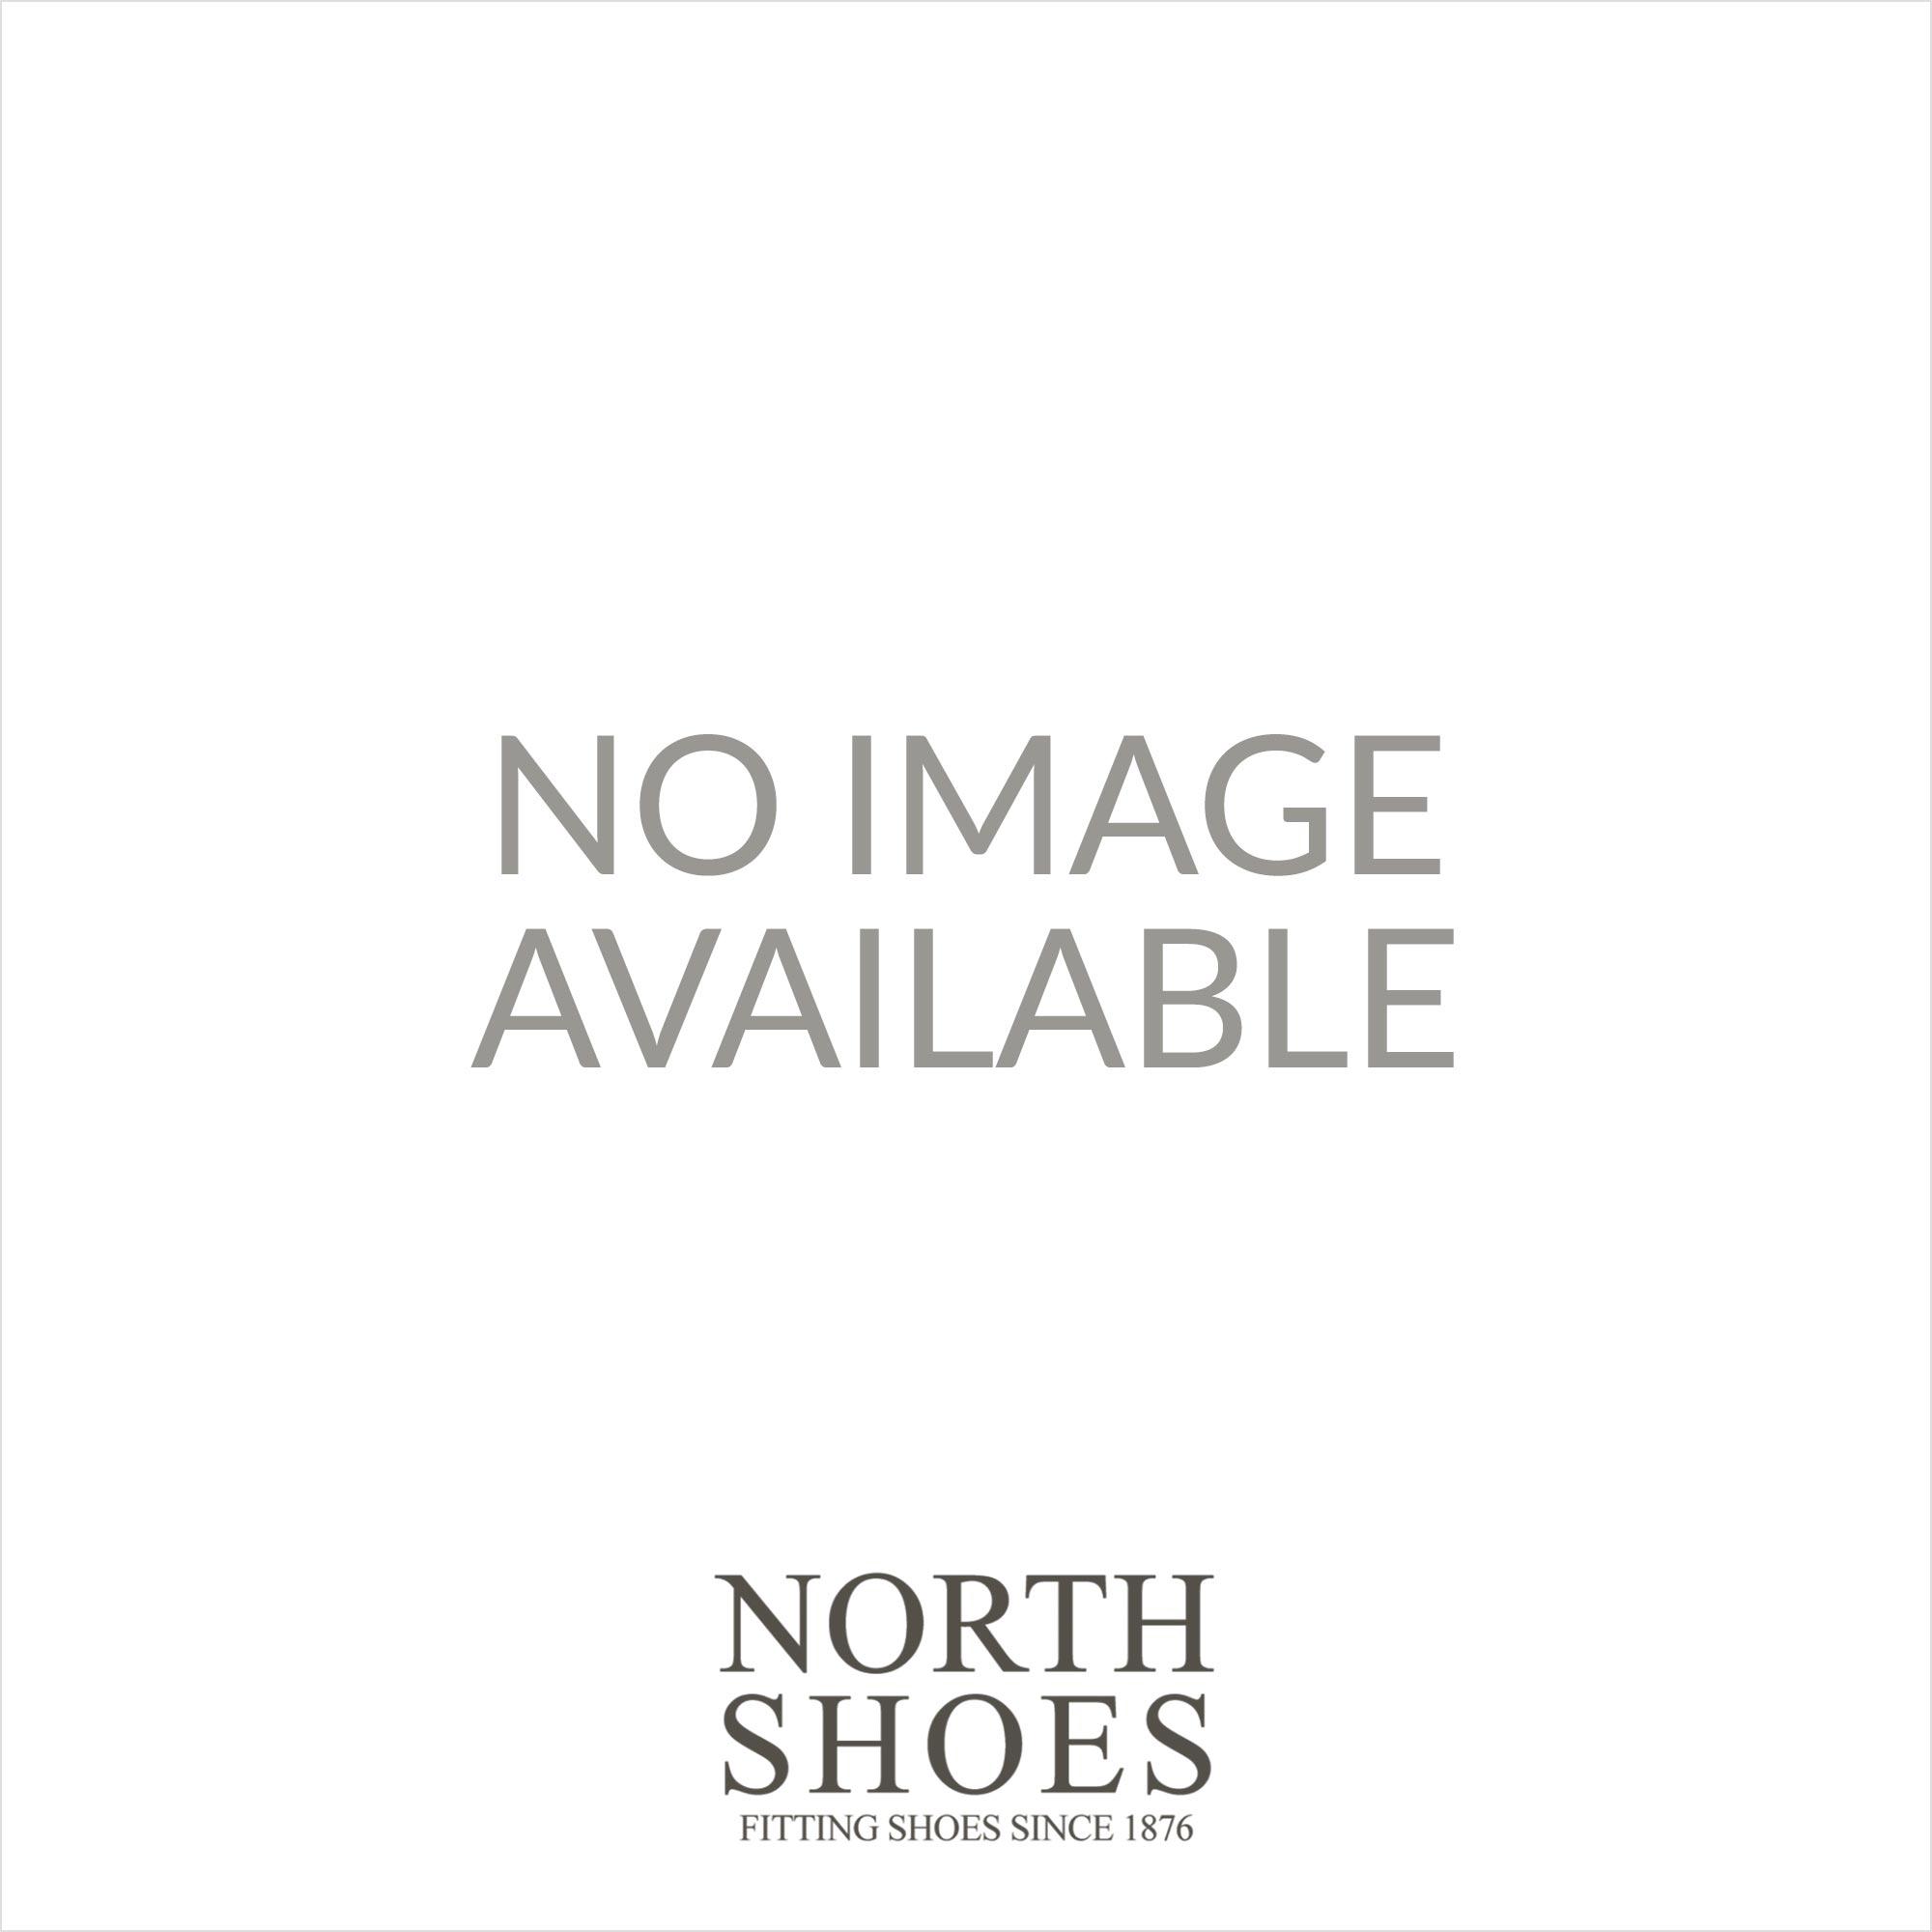 6c7059016e307 Mens Clarks Couture Bloom Black Leather Womens Slip On Ballerina ...